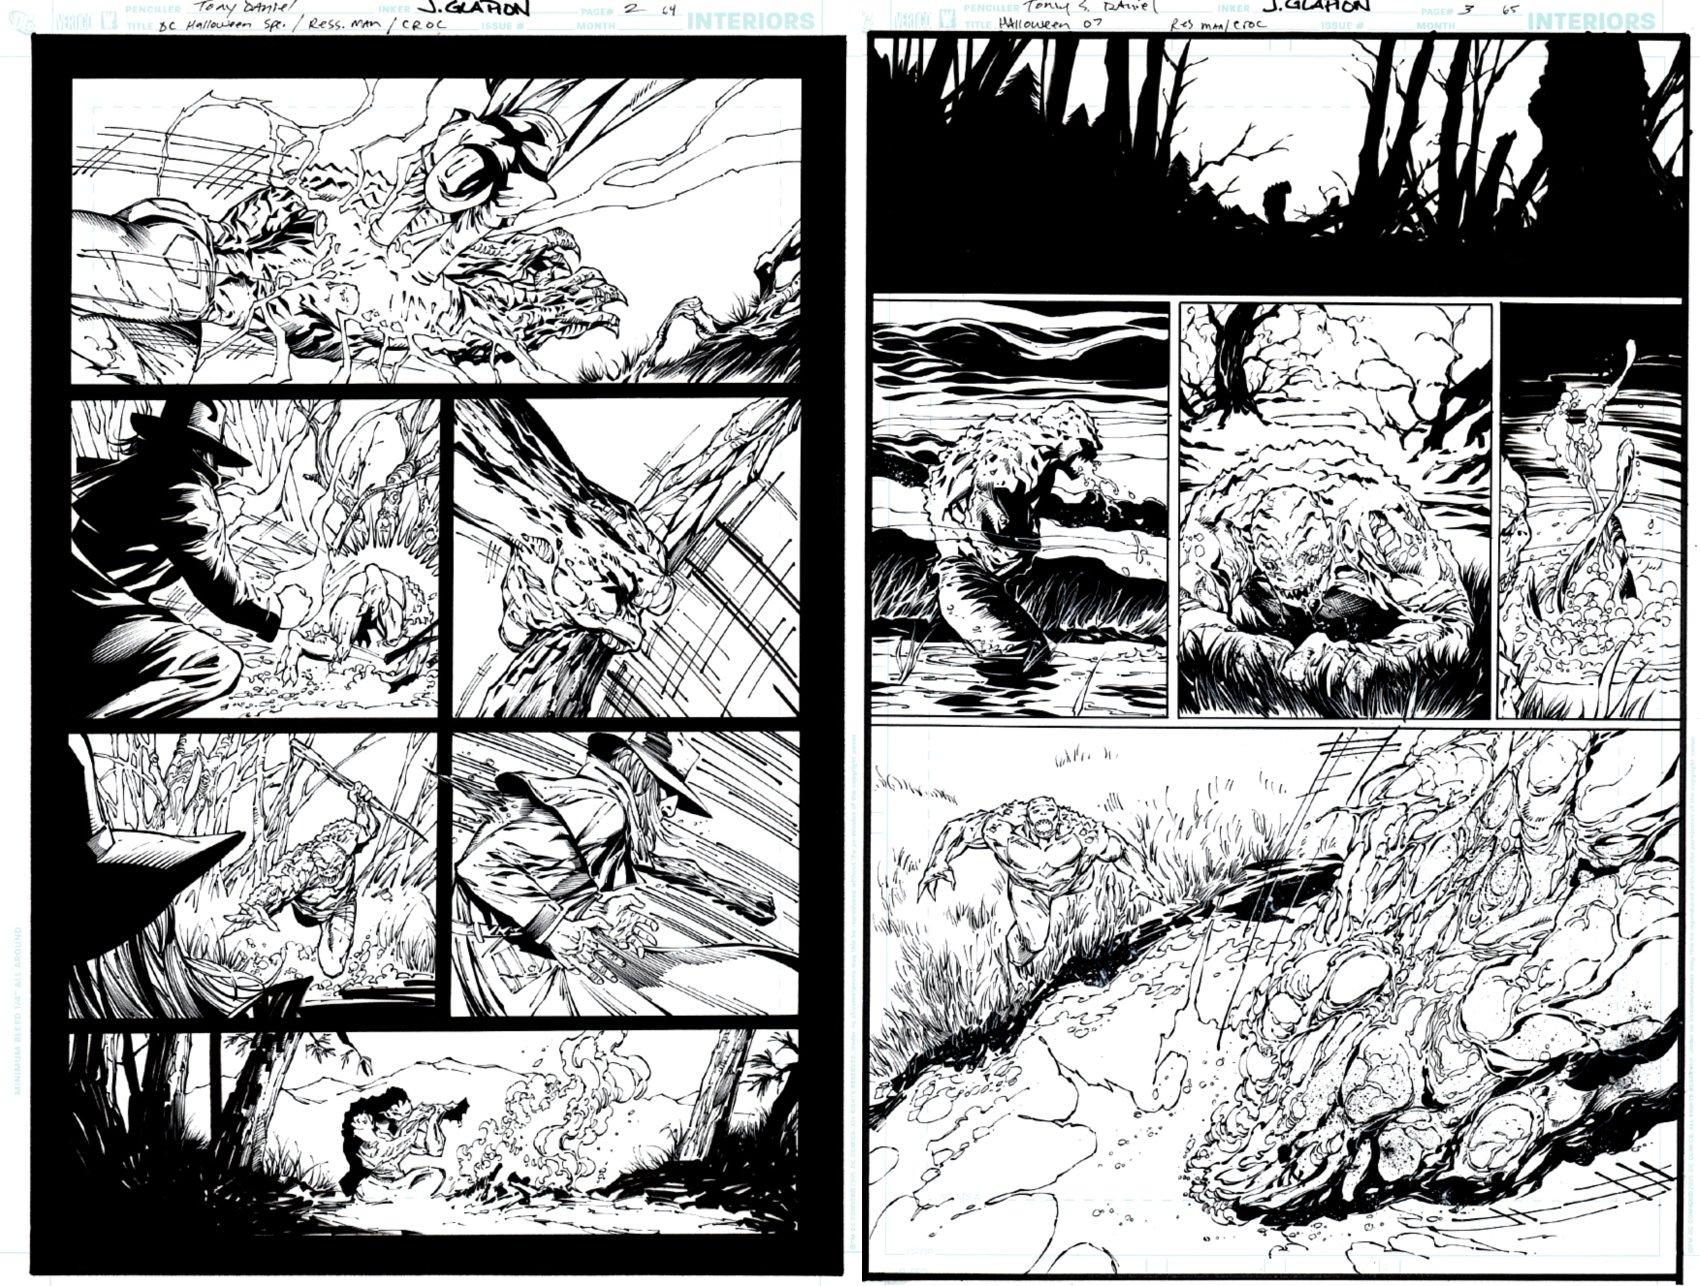 DC Infinite Halloween Special #1 pages 64 & 65 (KILLER CROC KILLS & EATS RESSURECTION MAN!) 2007